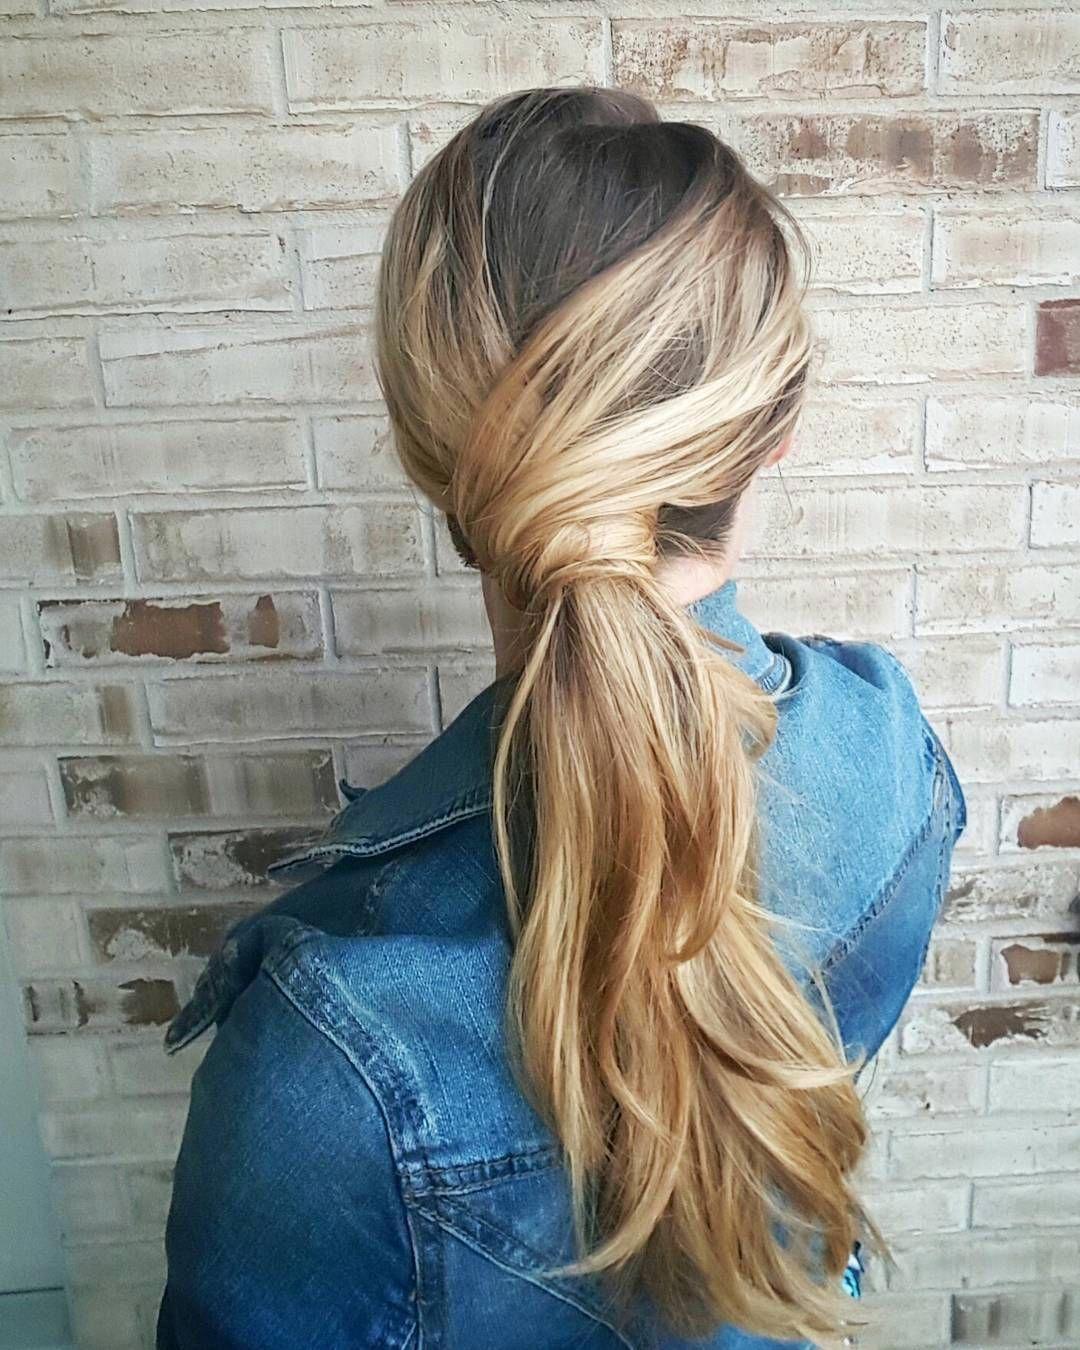 Diy Wedding Guest Hair: Stunning Long Length Hair Care #edgylonghairstyles